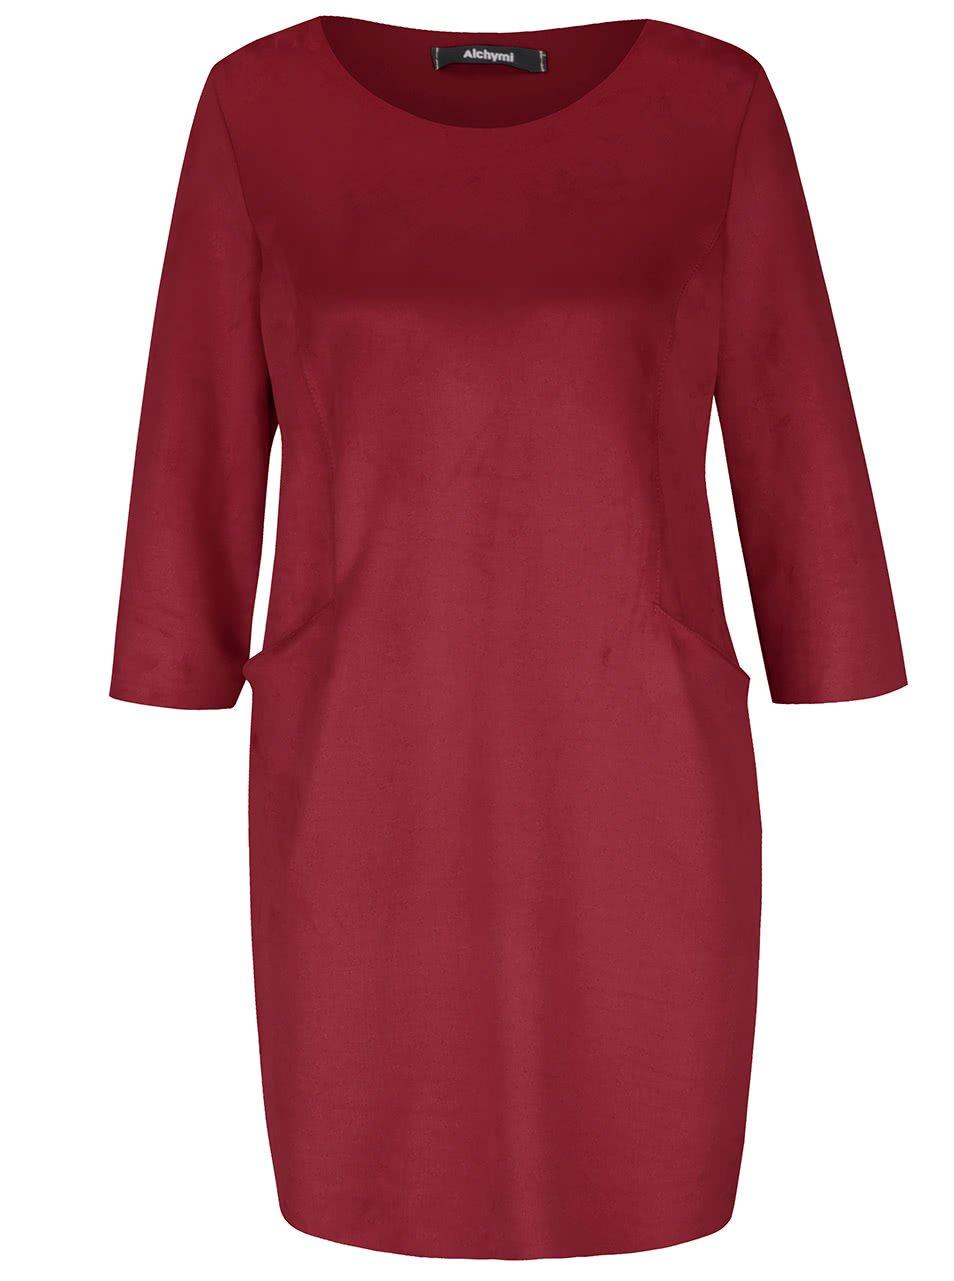 Vínové sametové šaty s kapsami Alchymi